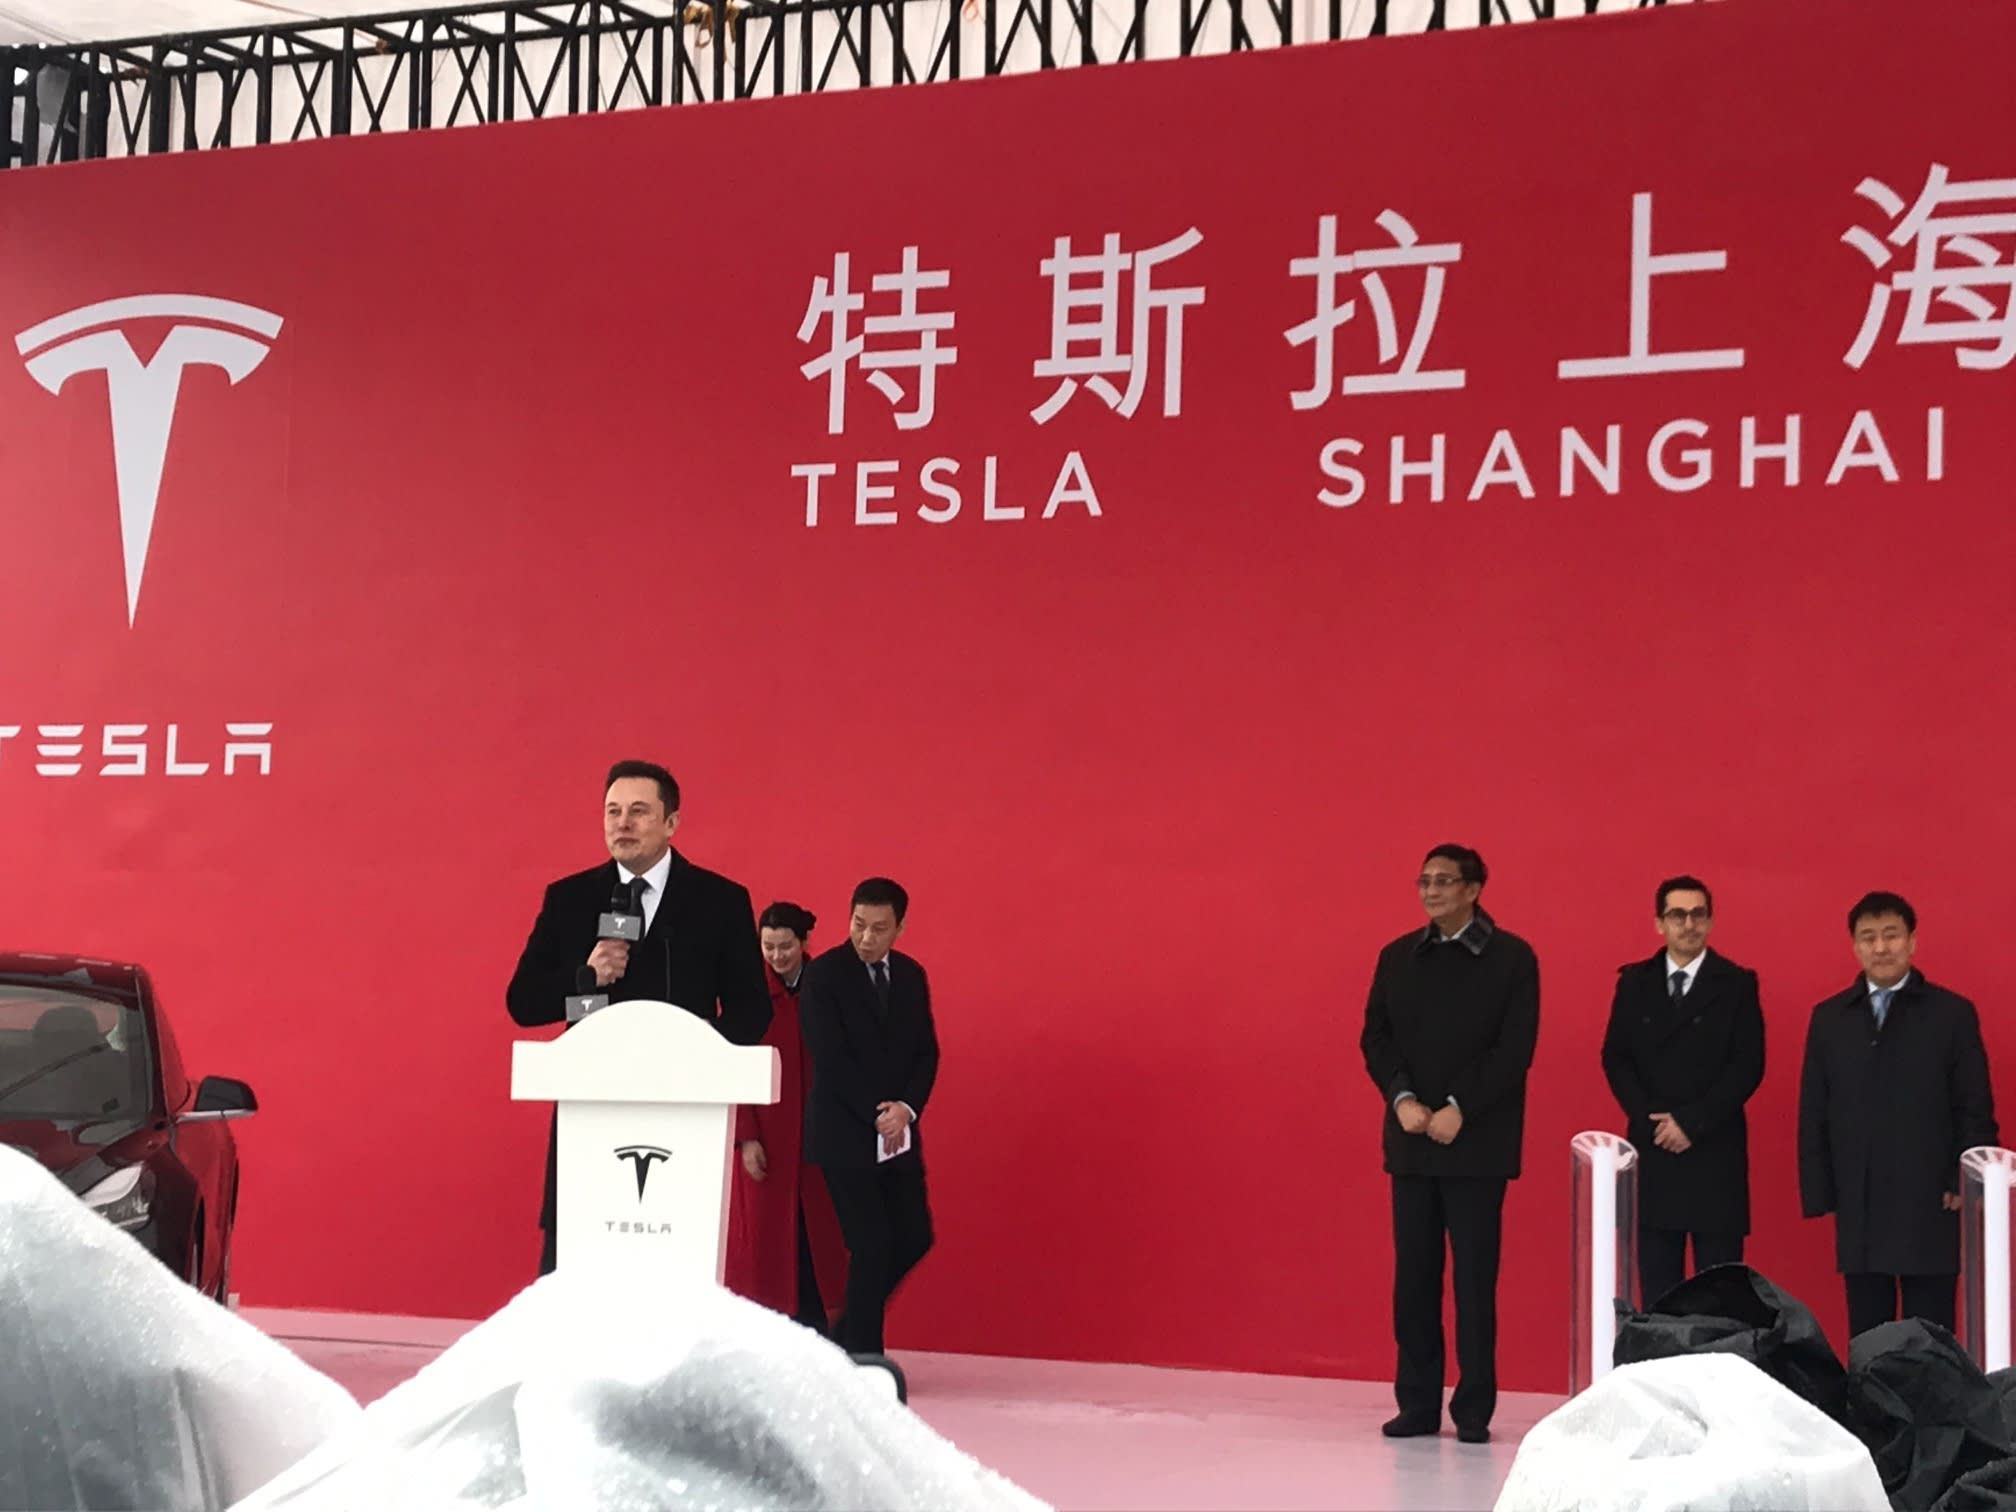 Jim Cramer: Tesla's success is reminiscent of Amazon and Netflix